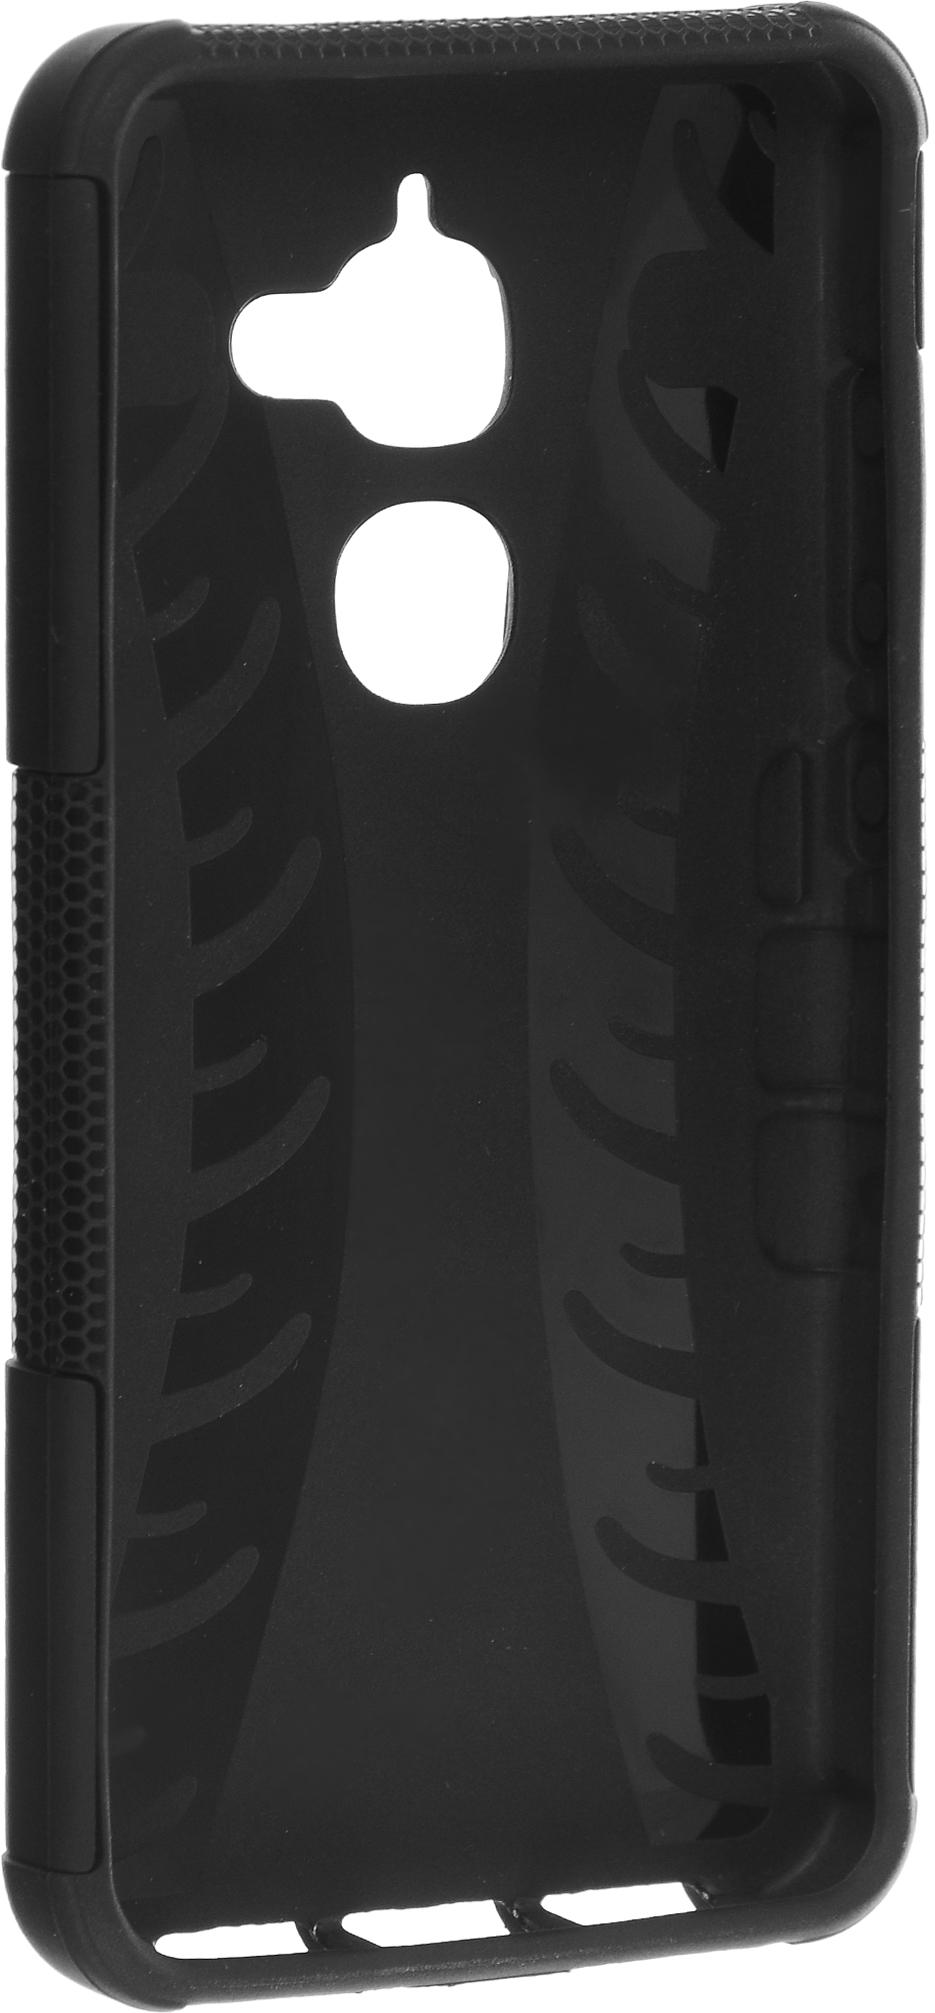 Skinbox Defender Case чехол-накладка для LeEco Le 2 Pro, Black защитный чехол biaze для leeco le 2 le 2 pro